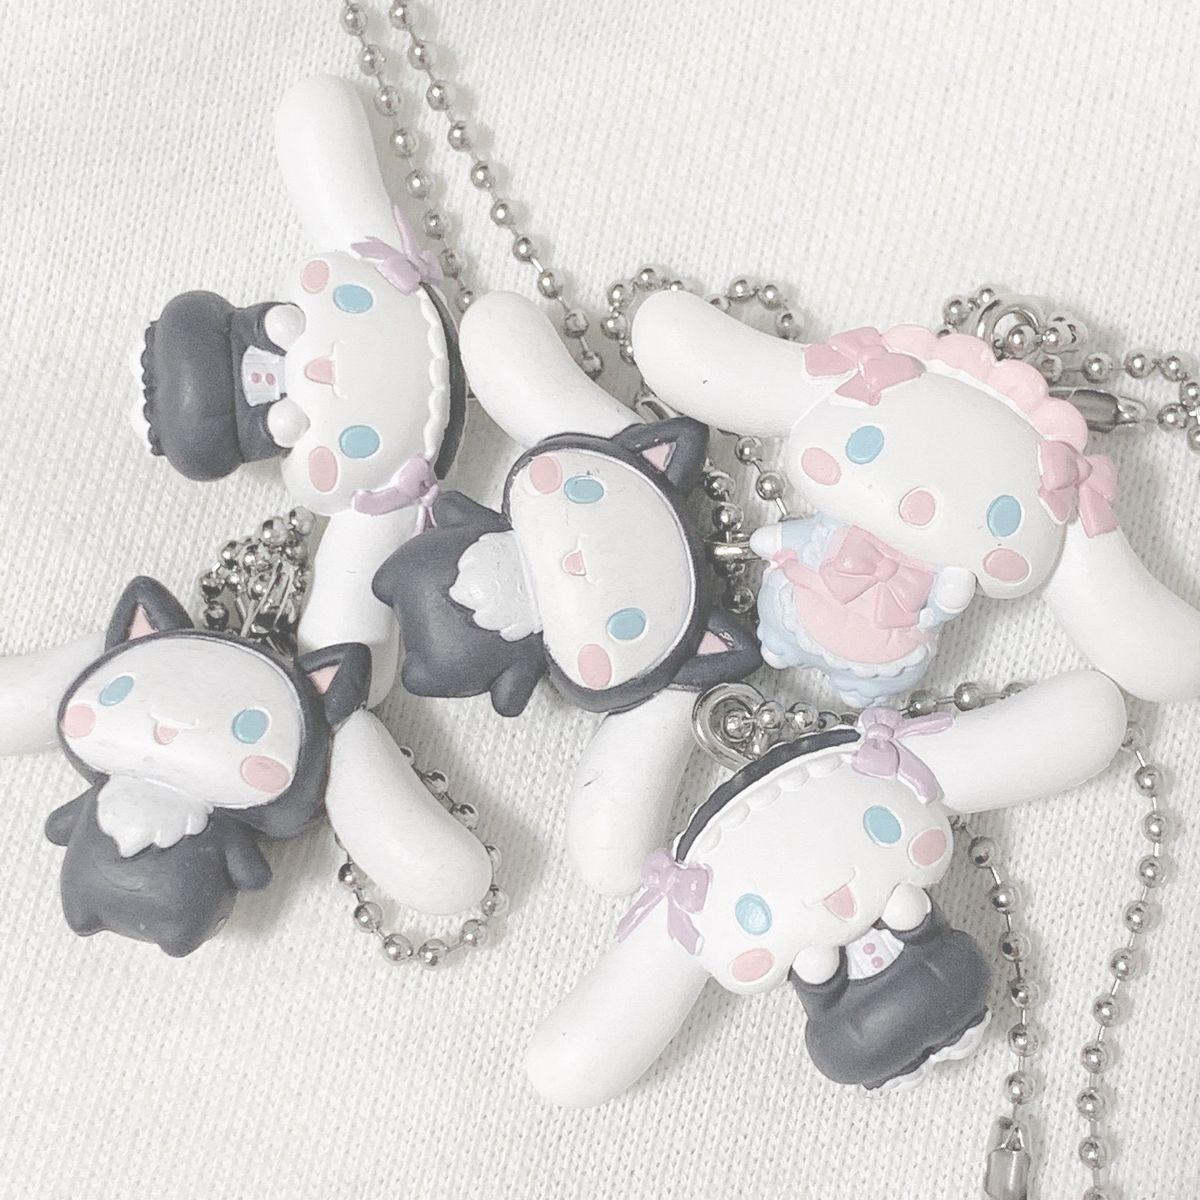 Pin on Nihonjin Kureijī Fashion